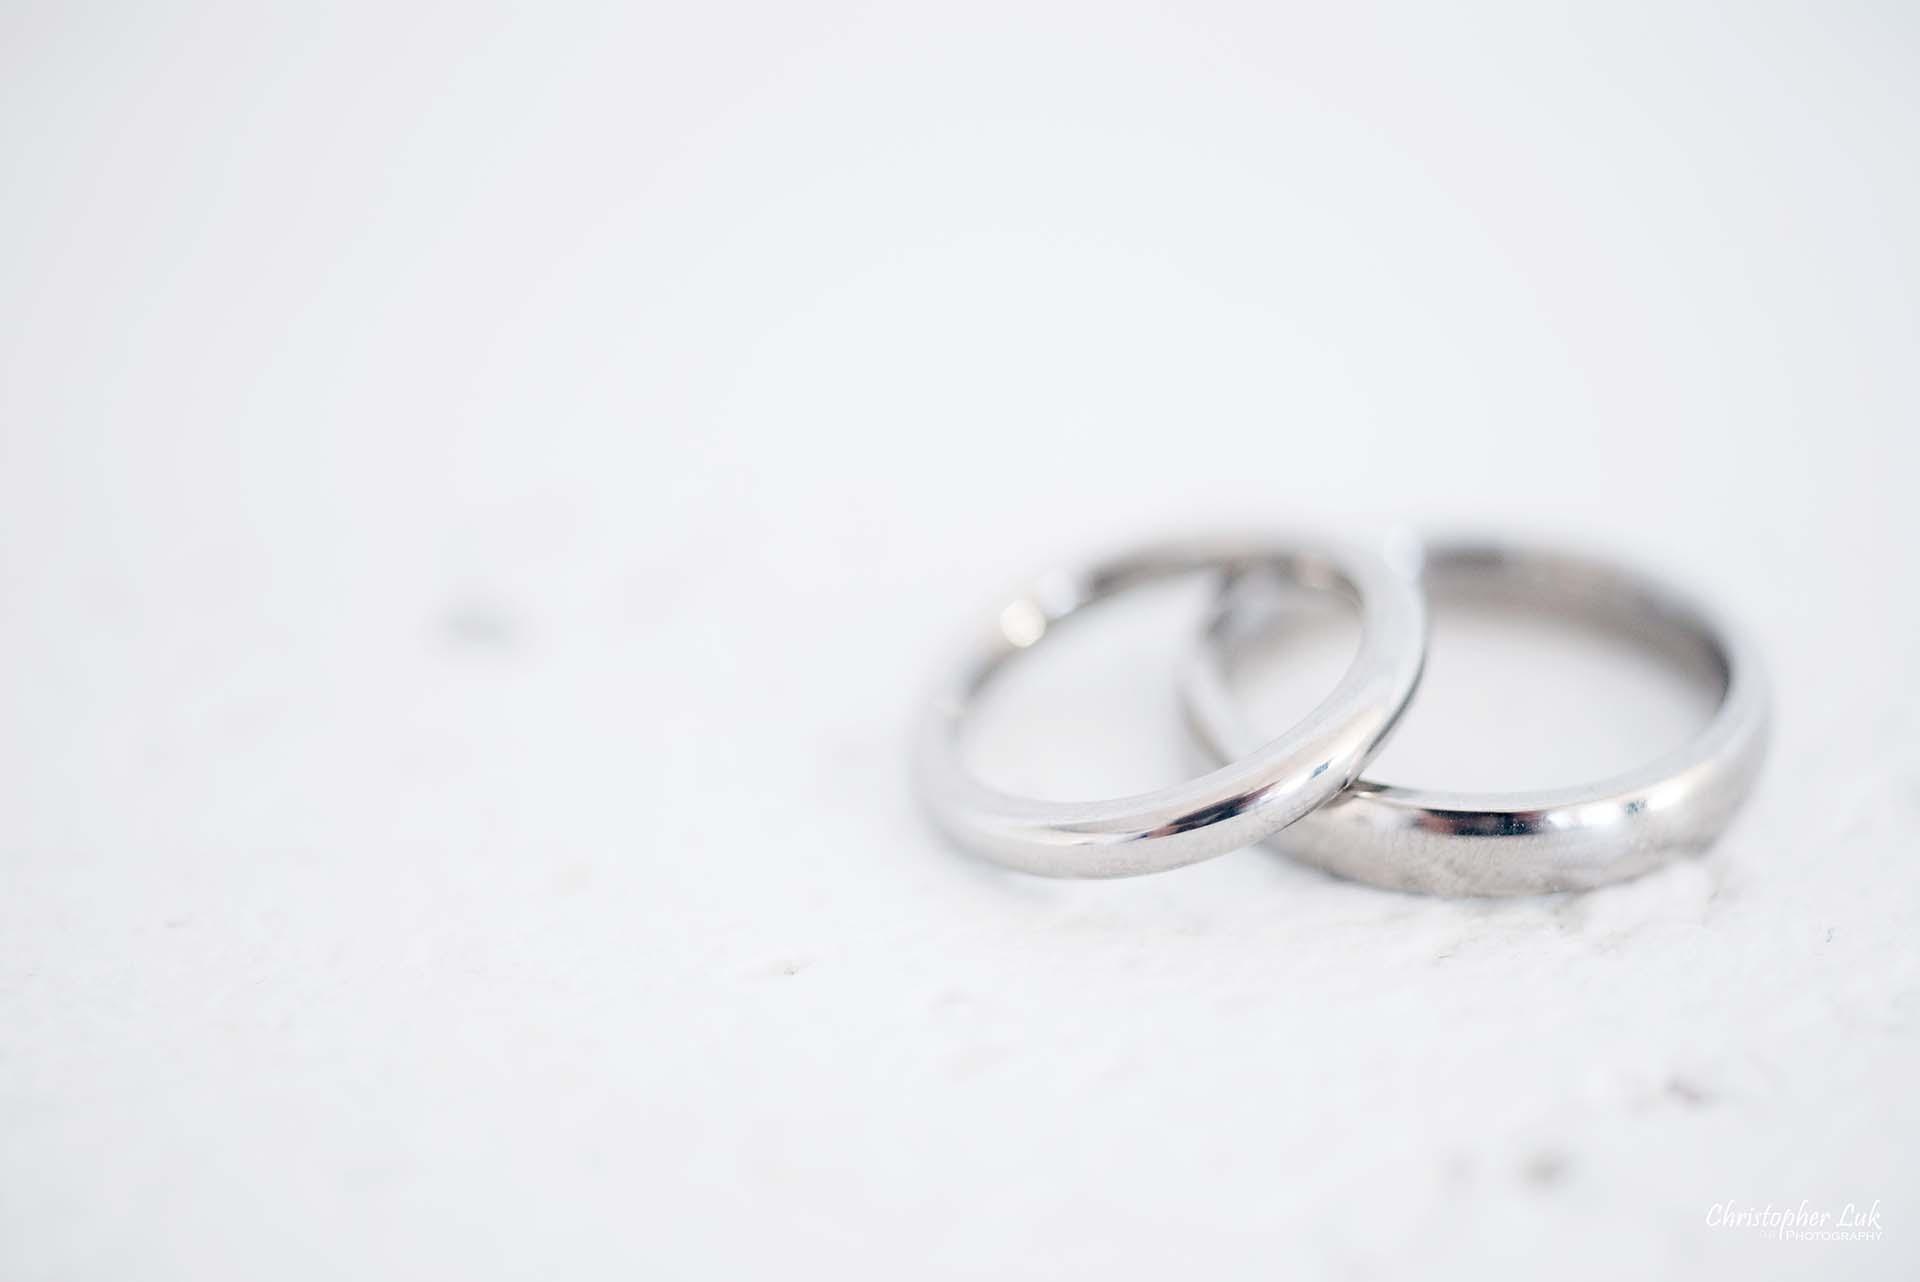 Christopher Luk Toronto Wedding Photographer - Mint Room Studios Bands Rings Detail